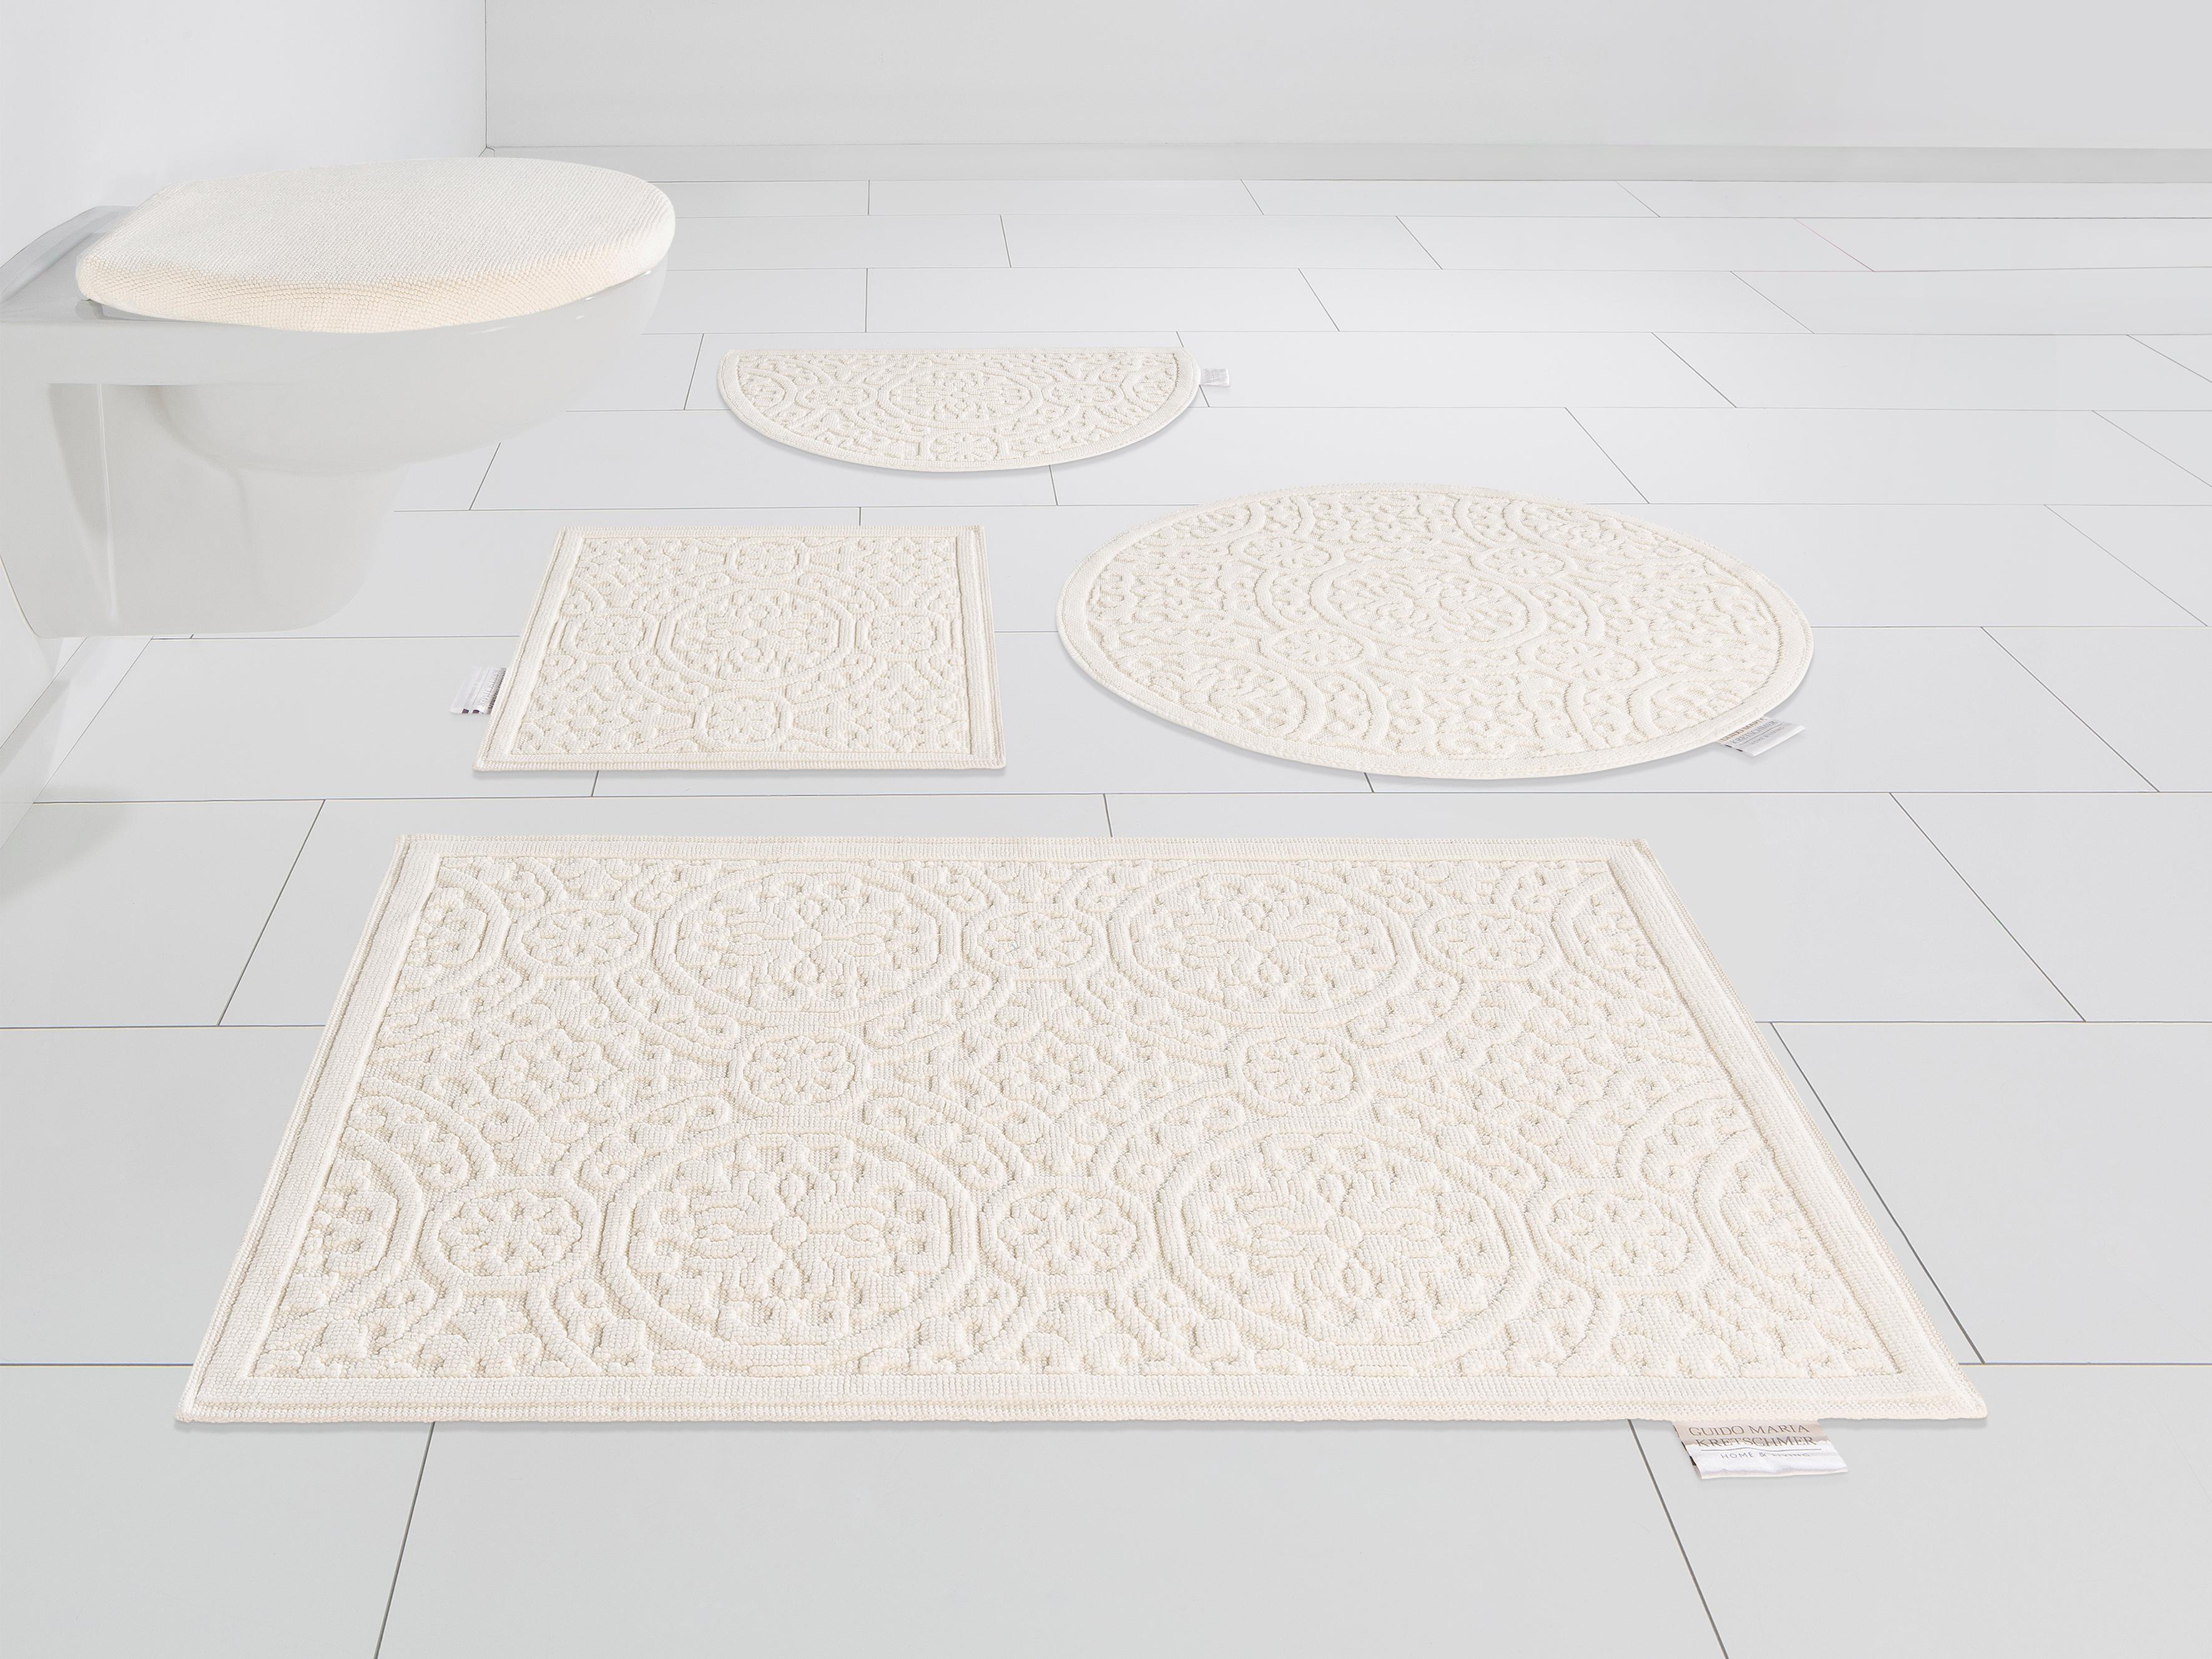 Badematte »Garden Pastels«, Guido Maria Kretschmer Home&Living, Höhe 3 mm | Bad > Badgarnituren > Badvorleger | GUIDO MARIA KRETSCHMER HOME & LIVING